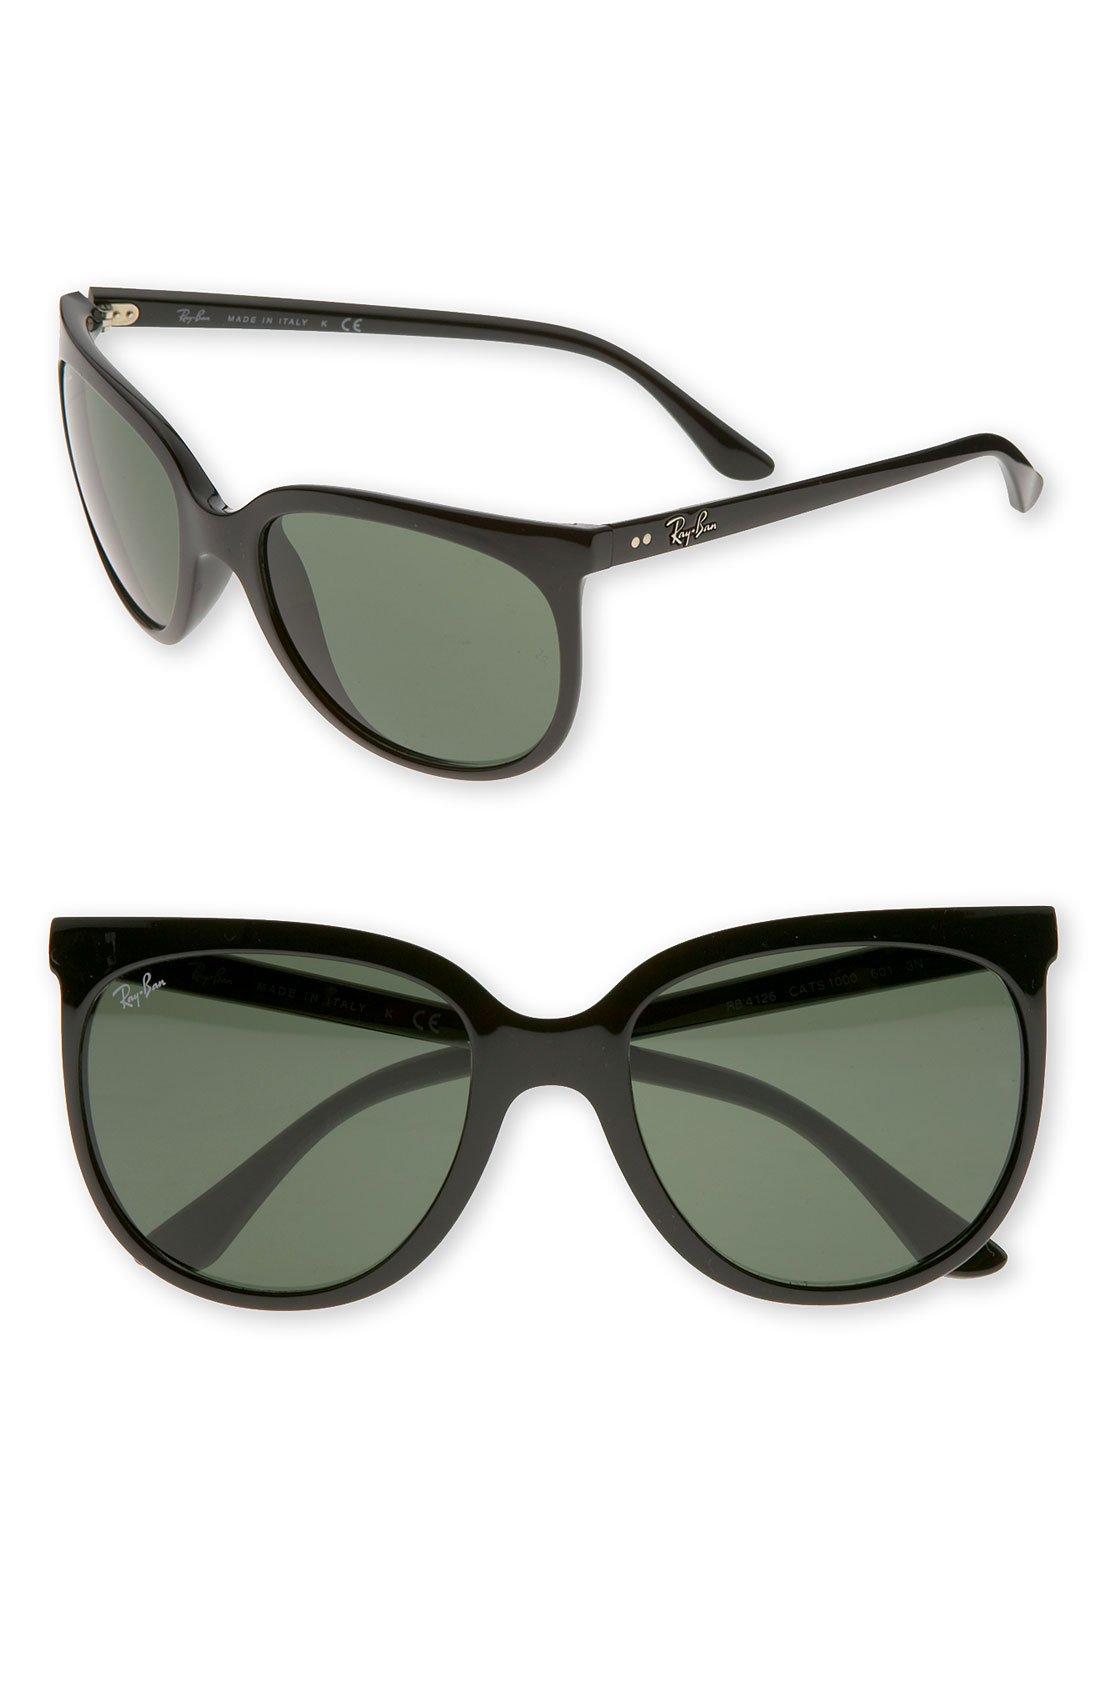 ray ban retro cat eye sunglasses. Black Bedroom Furniture Sets. Home Design Ideas